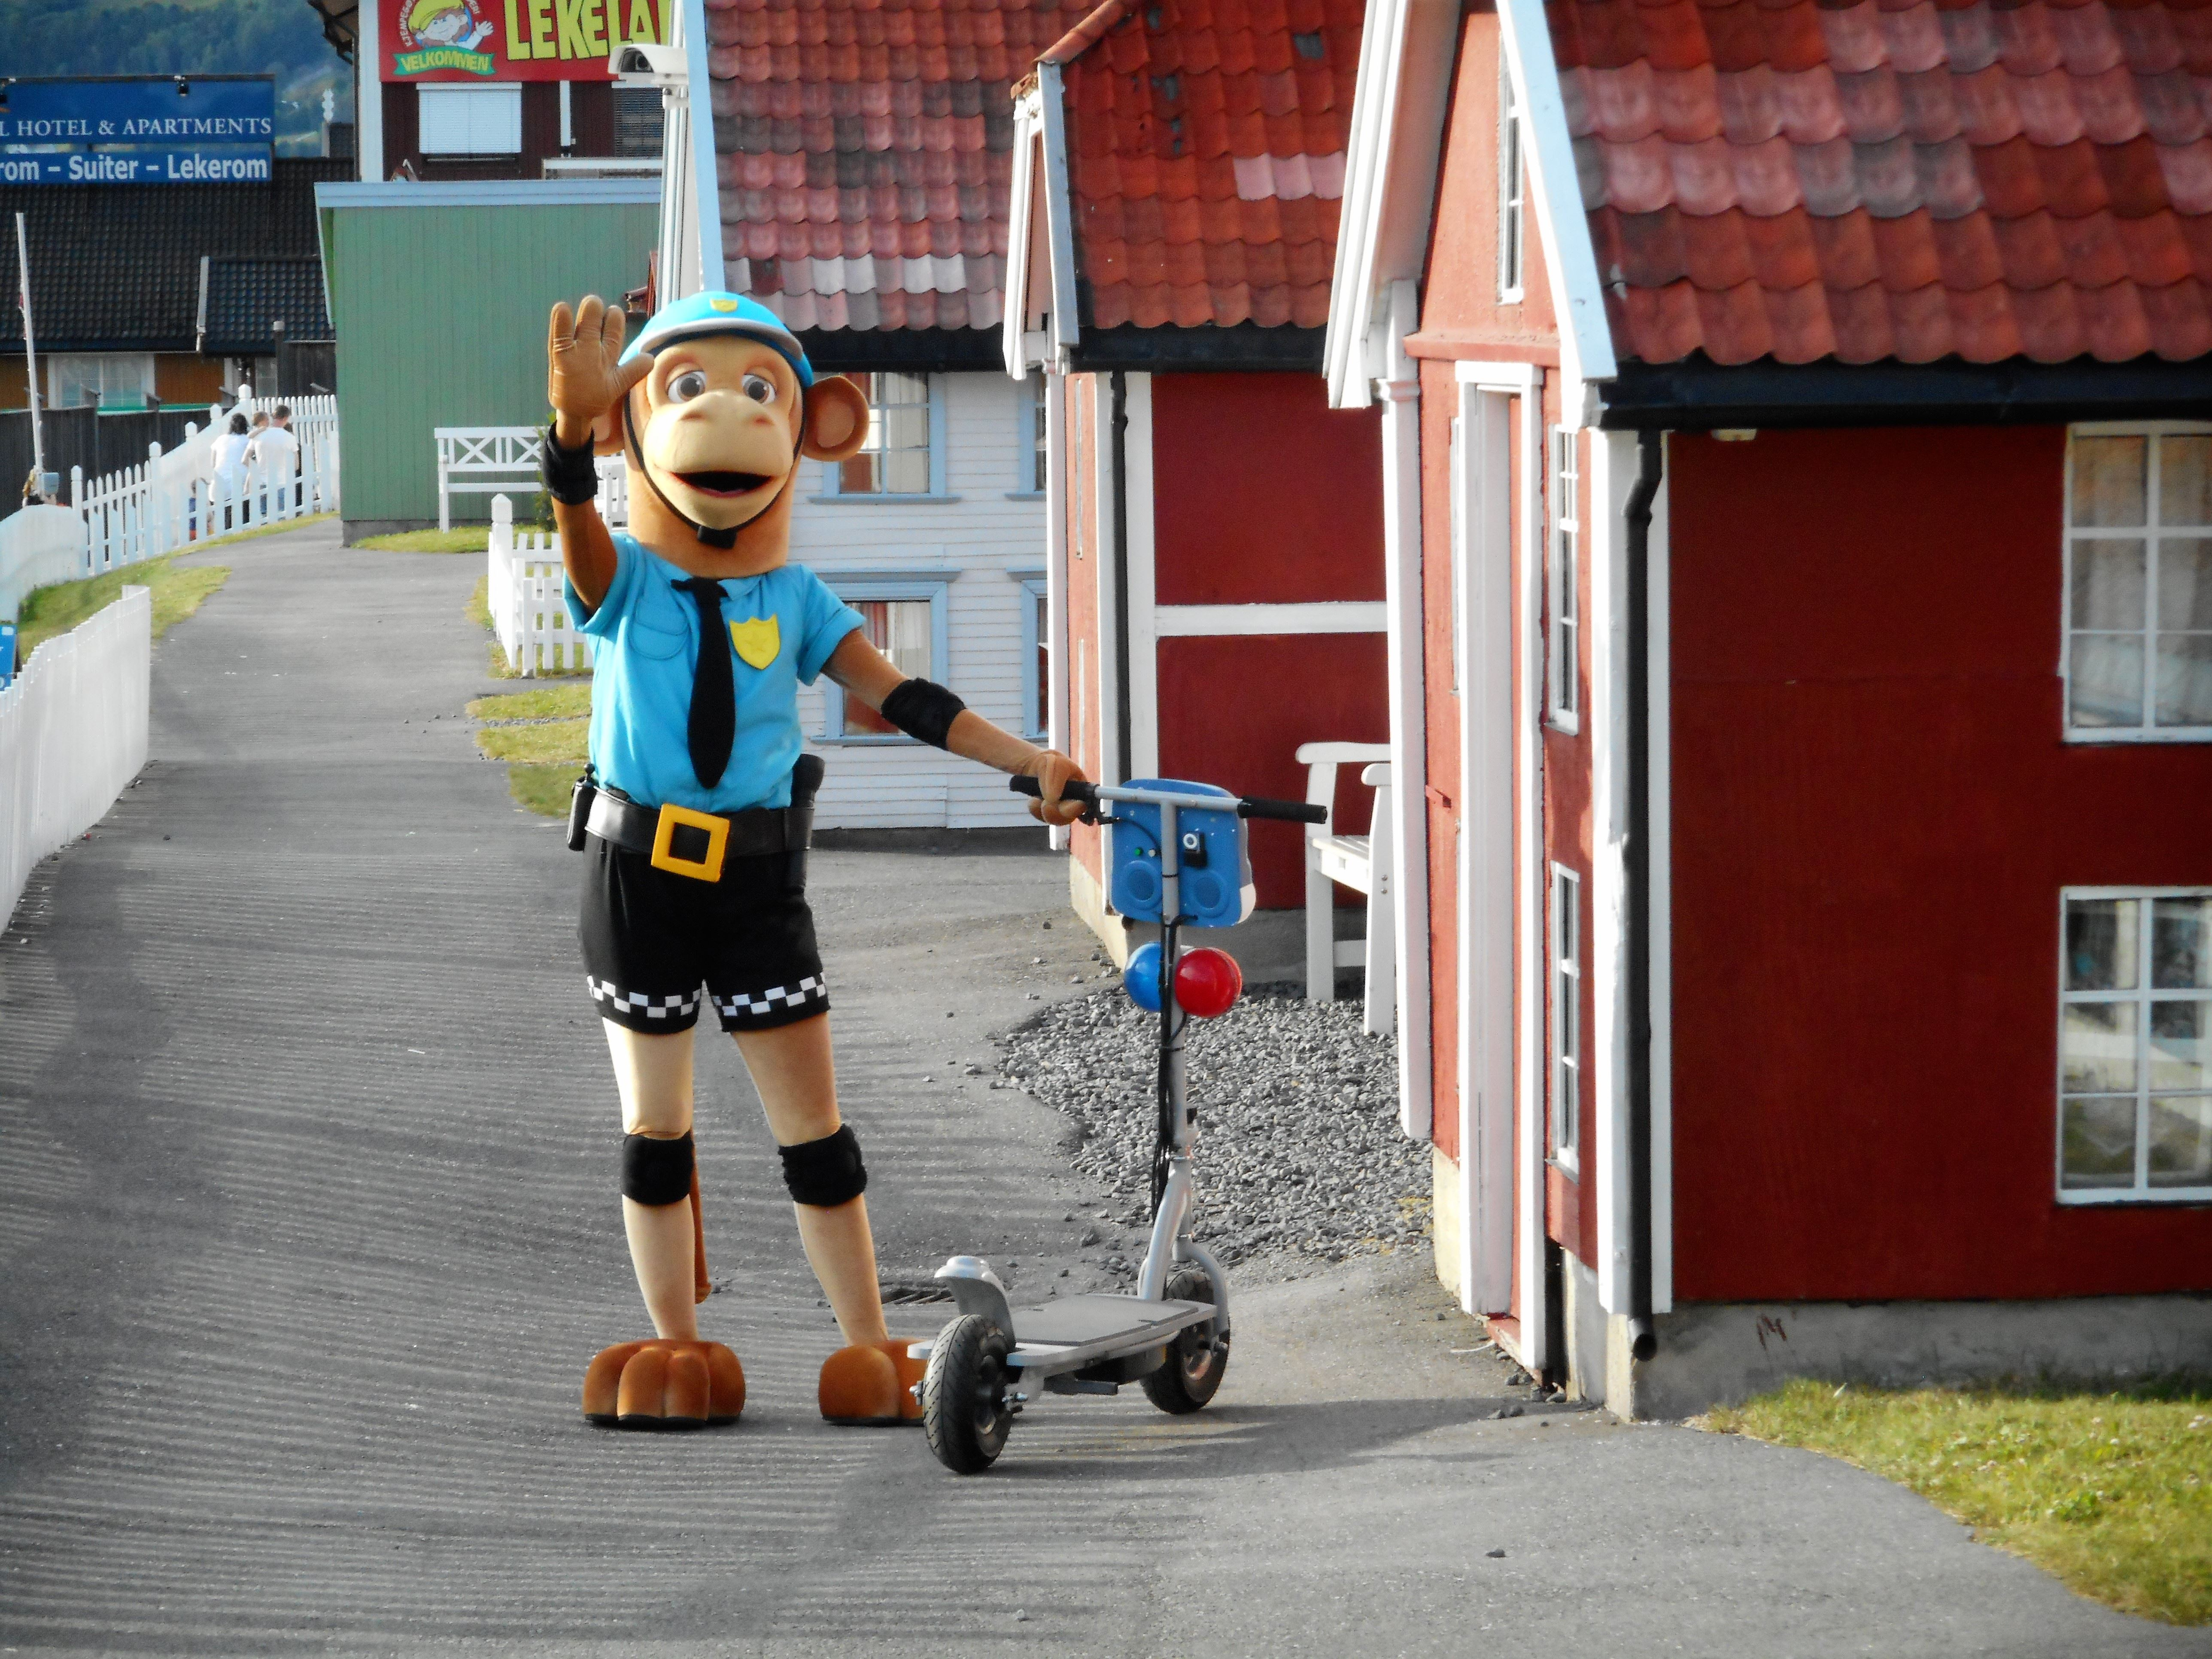 Lilleputthammer in Norwegen